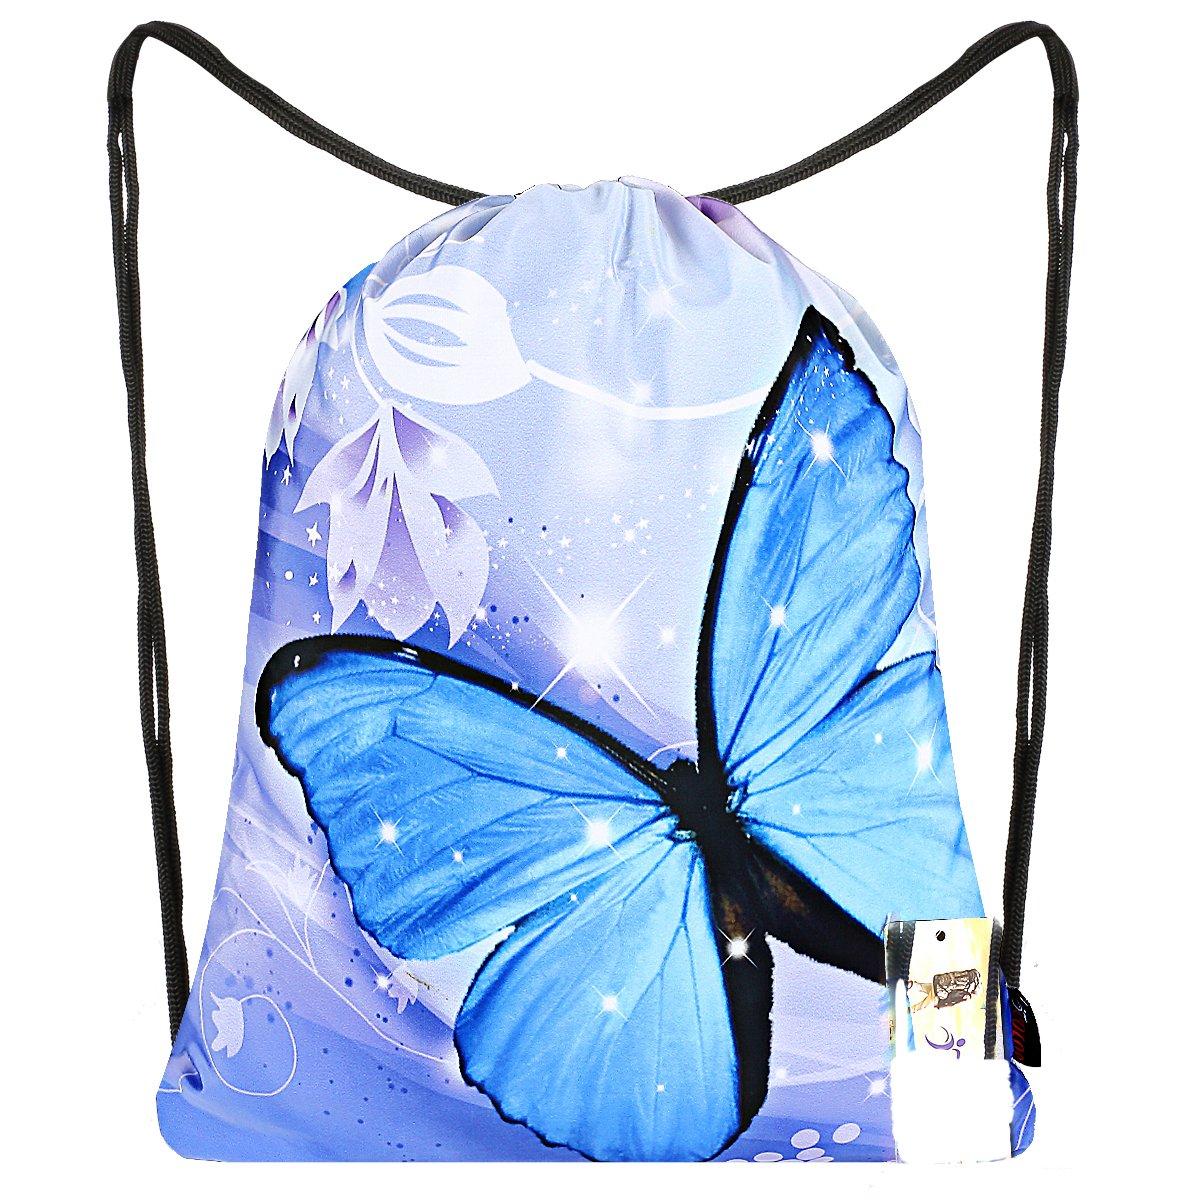 ICOLOR Drawstring Sackpack Backpack Gift Gym Bag Daypack for Women Teen Kids